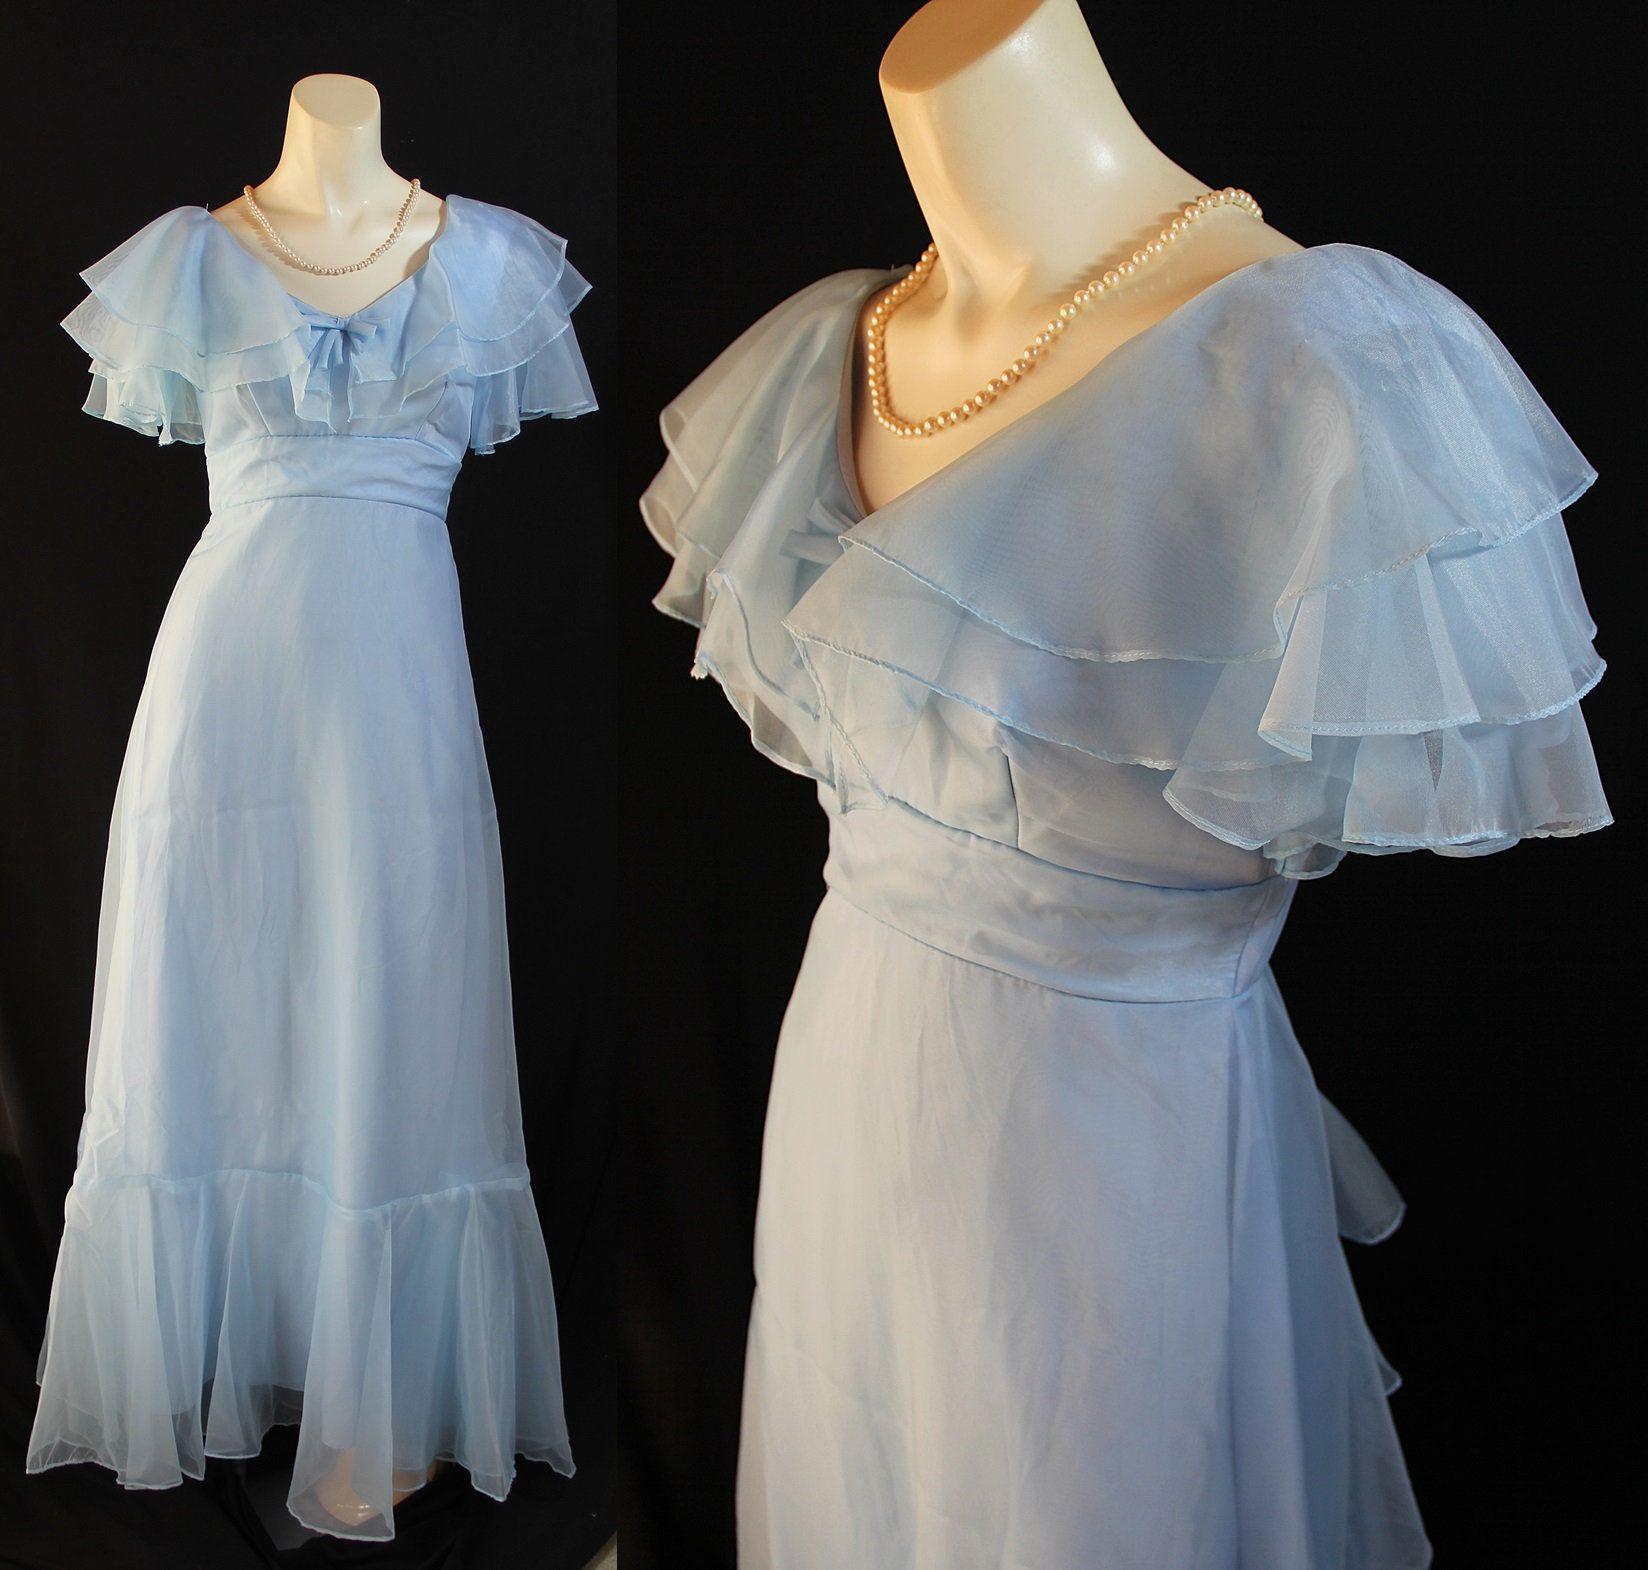 Vintage Maxi Dress Blue Wedding Southern Belle 70s Prom Etsy Vintage Maxi Dress Prom Dress Inspiration Dresses [ 1570 x 1648 Pixel ]